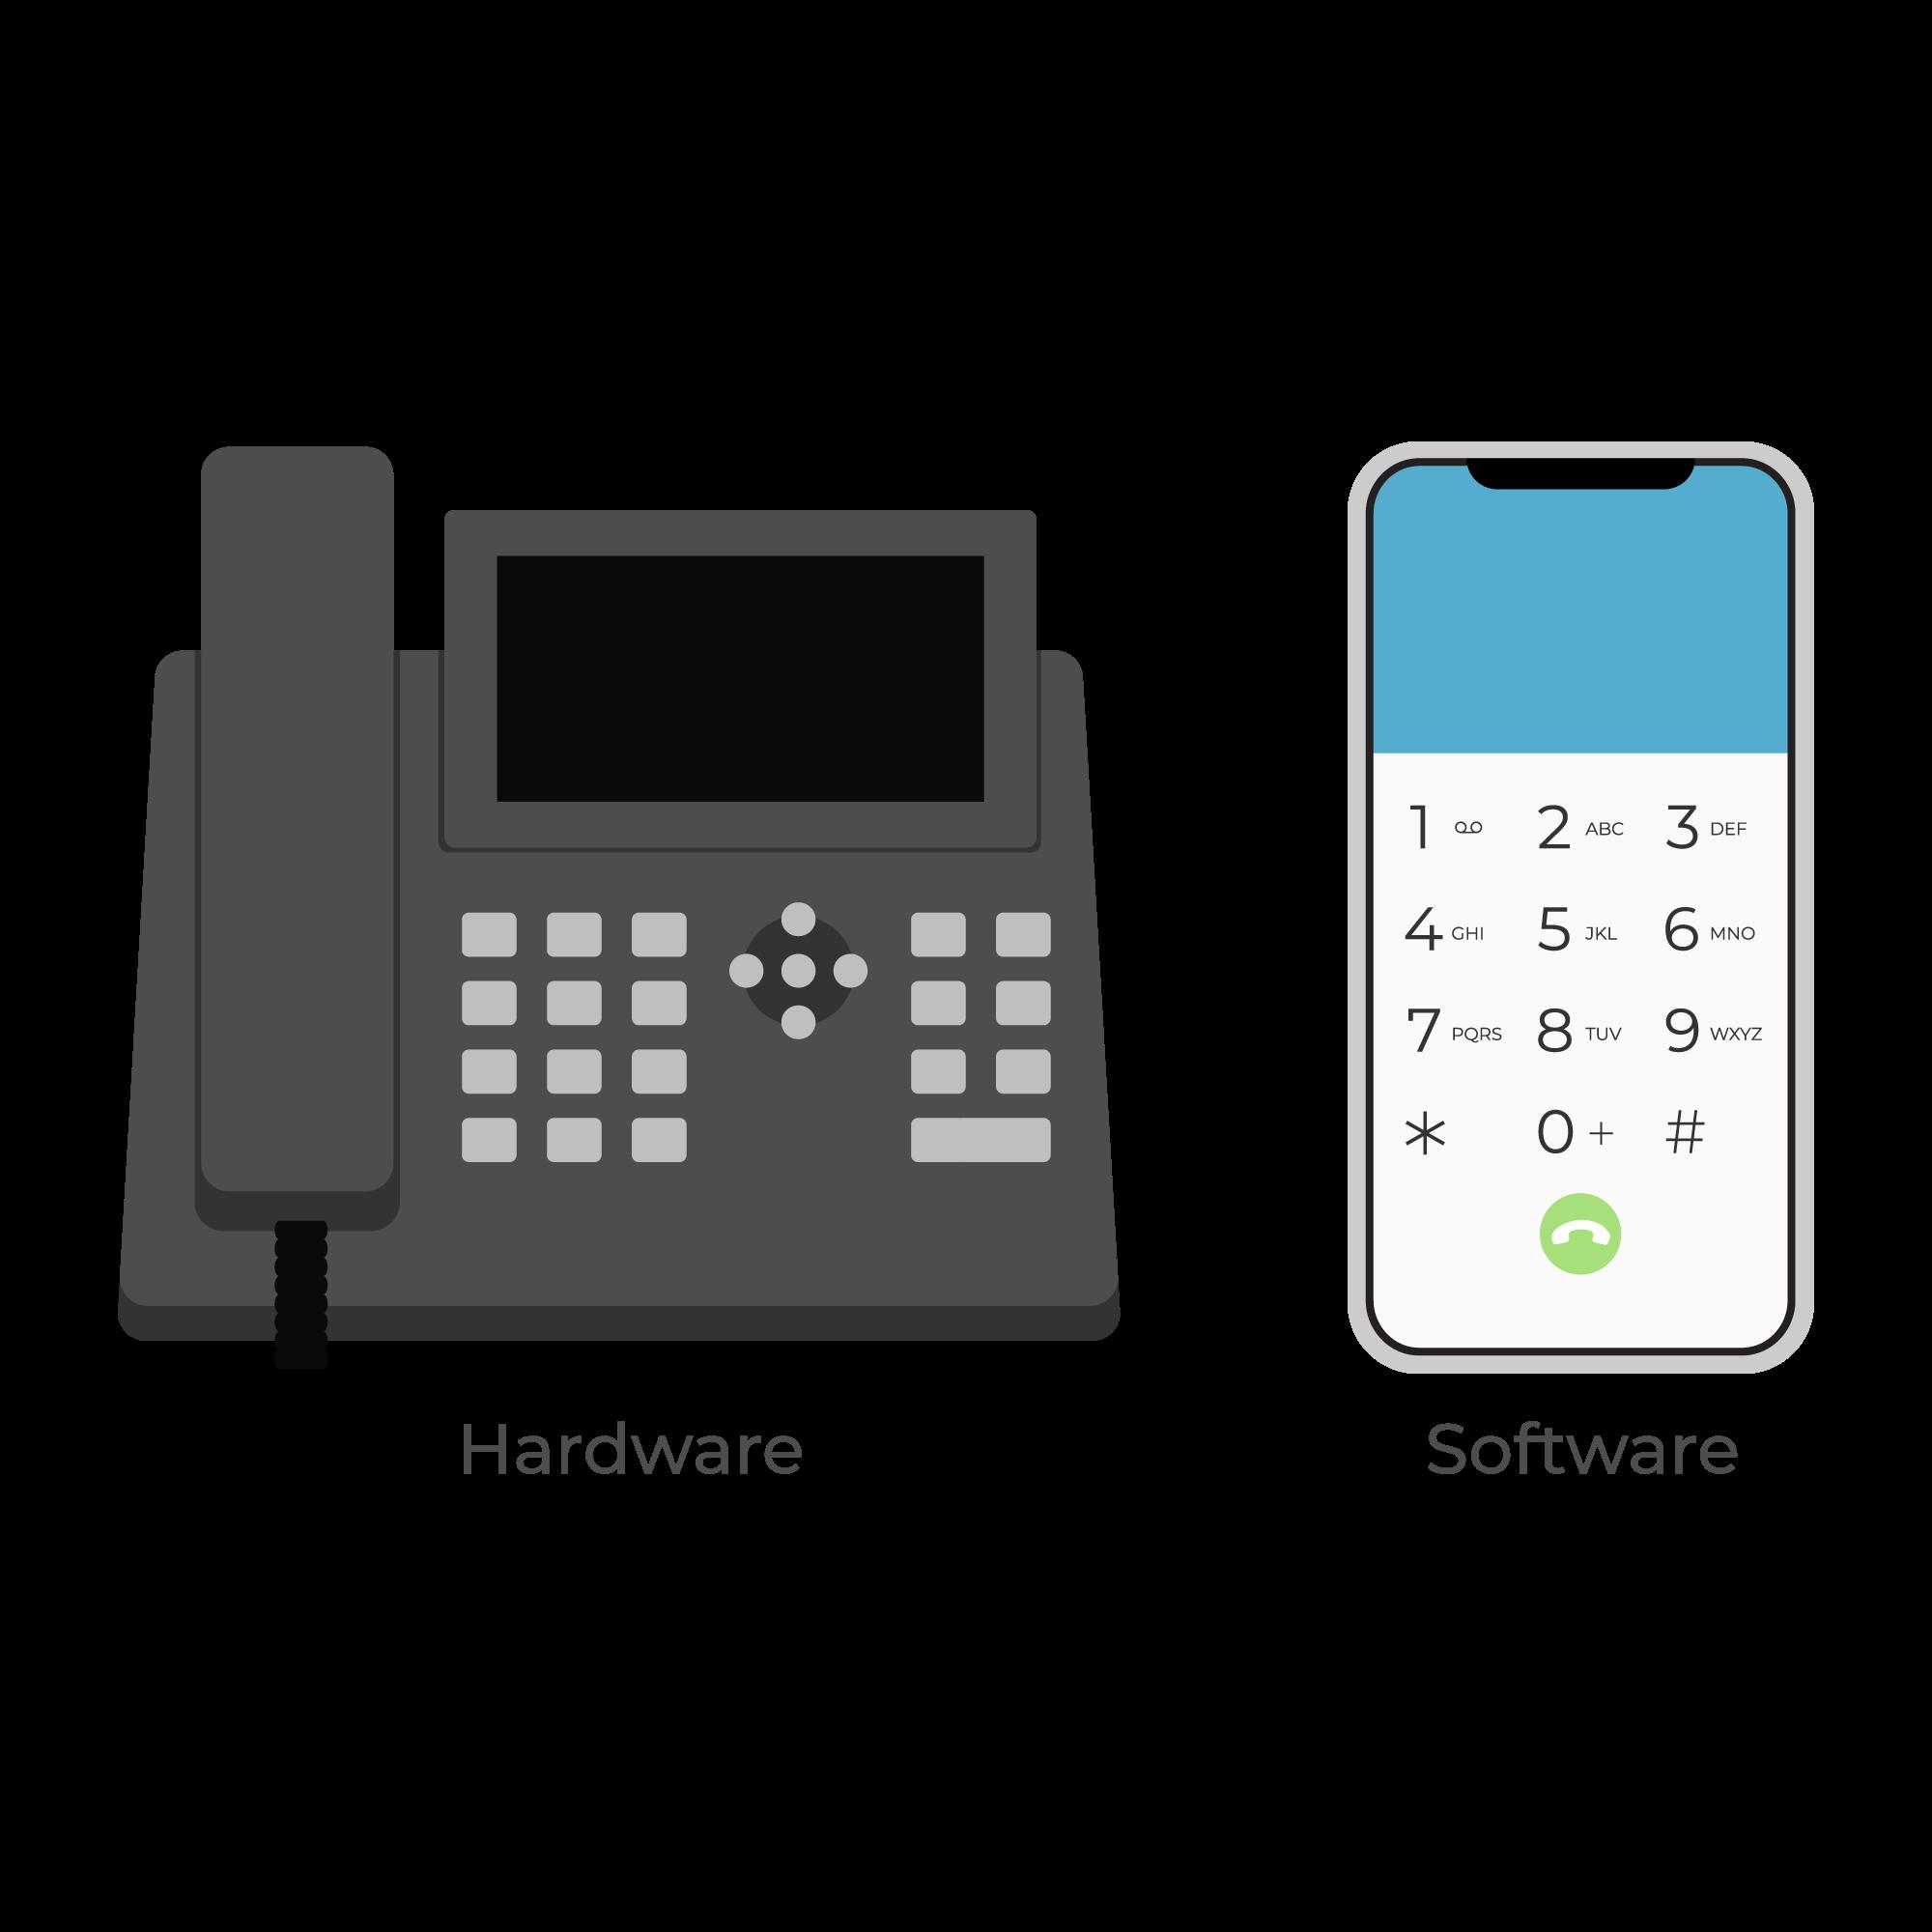 Hardware VOIP & Software VOIP